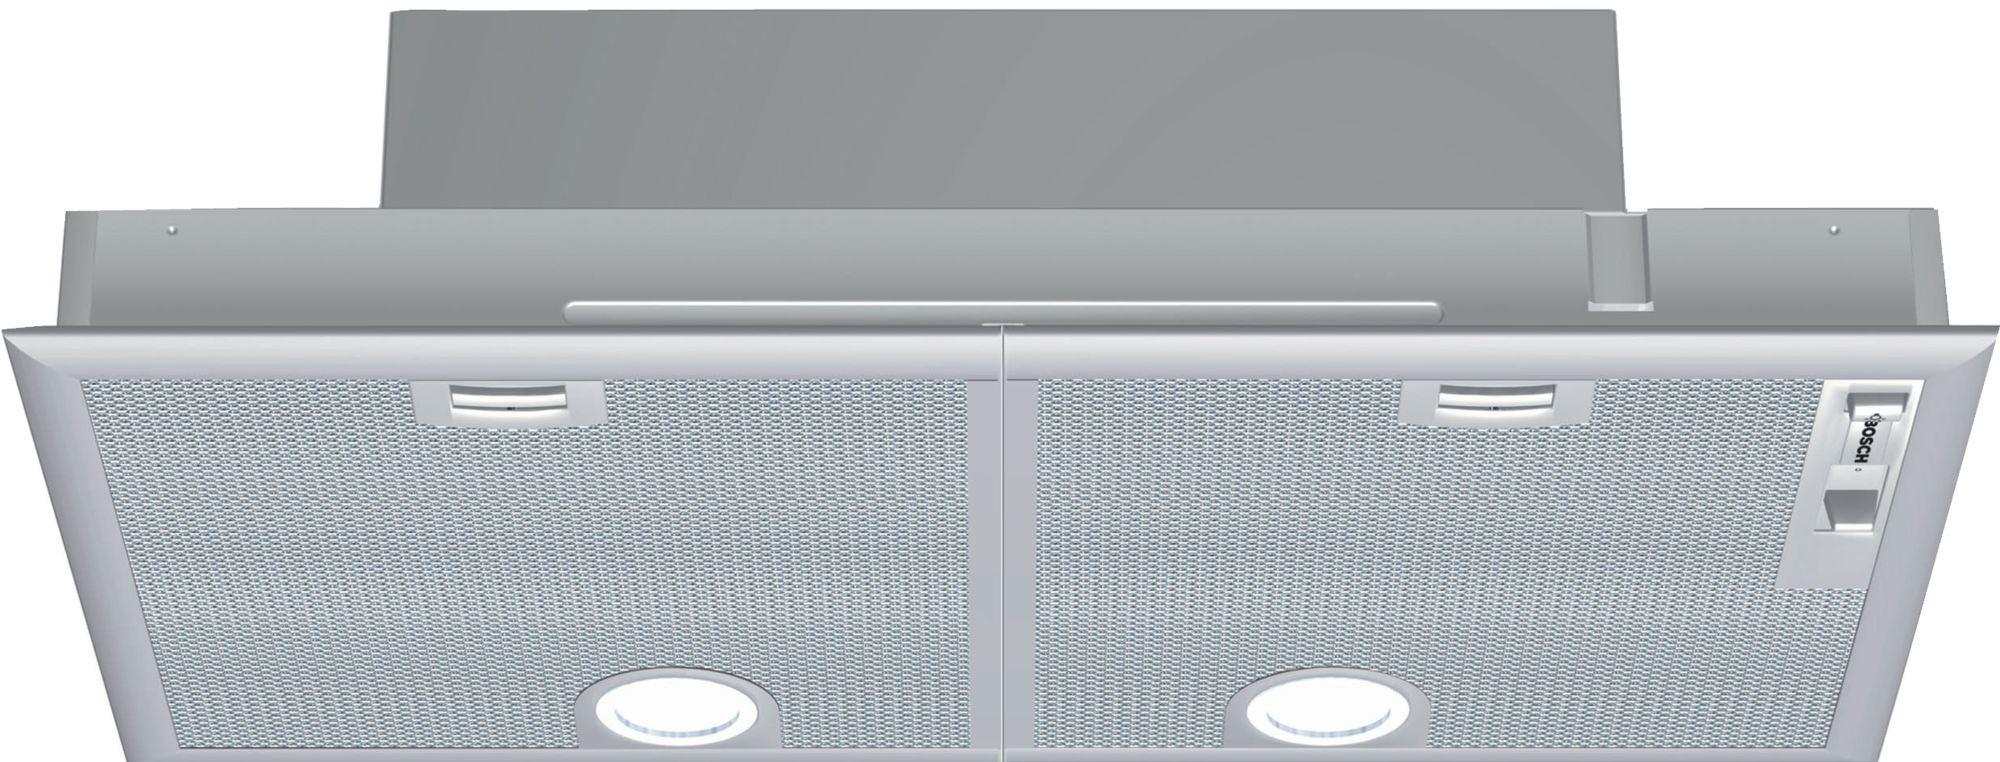 Bosch DHL755BL Afzuigkap onderbouw Zilver